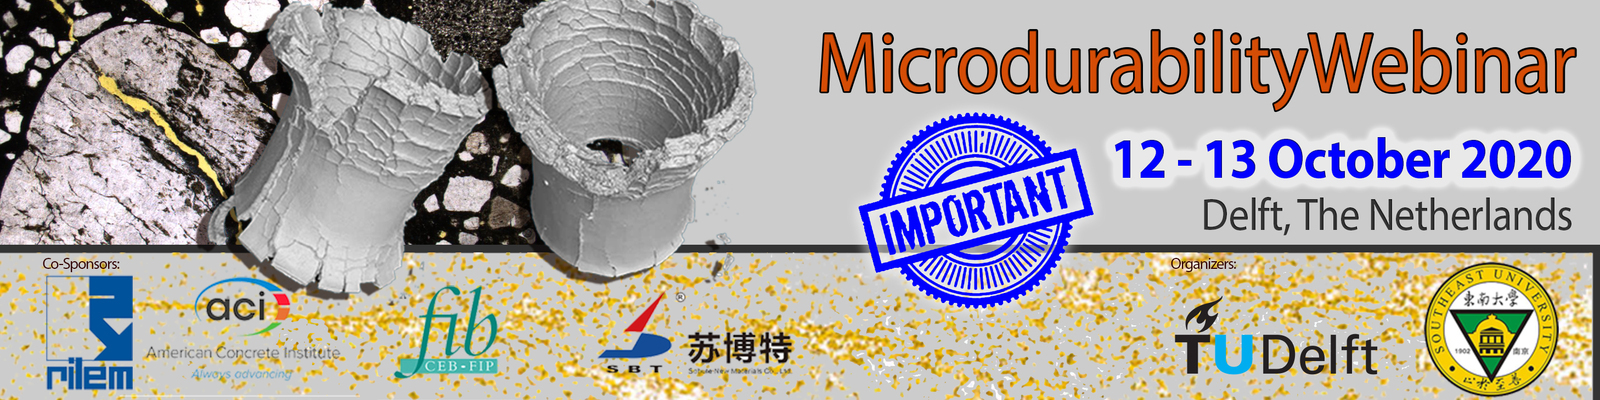 Virtual Event Microdurability2020 12&13 October 2020